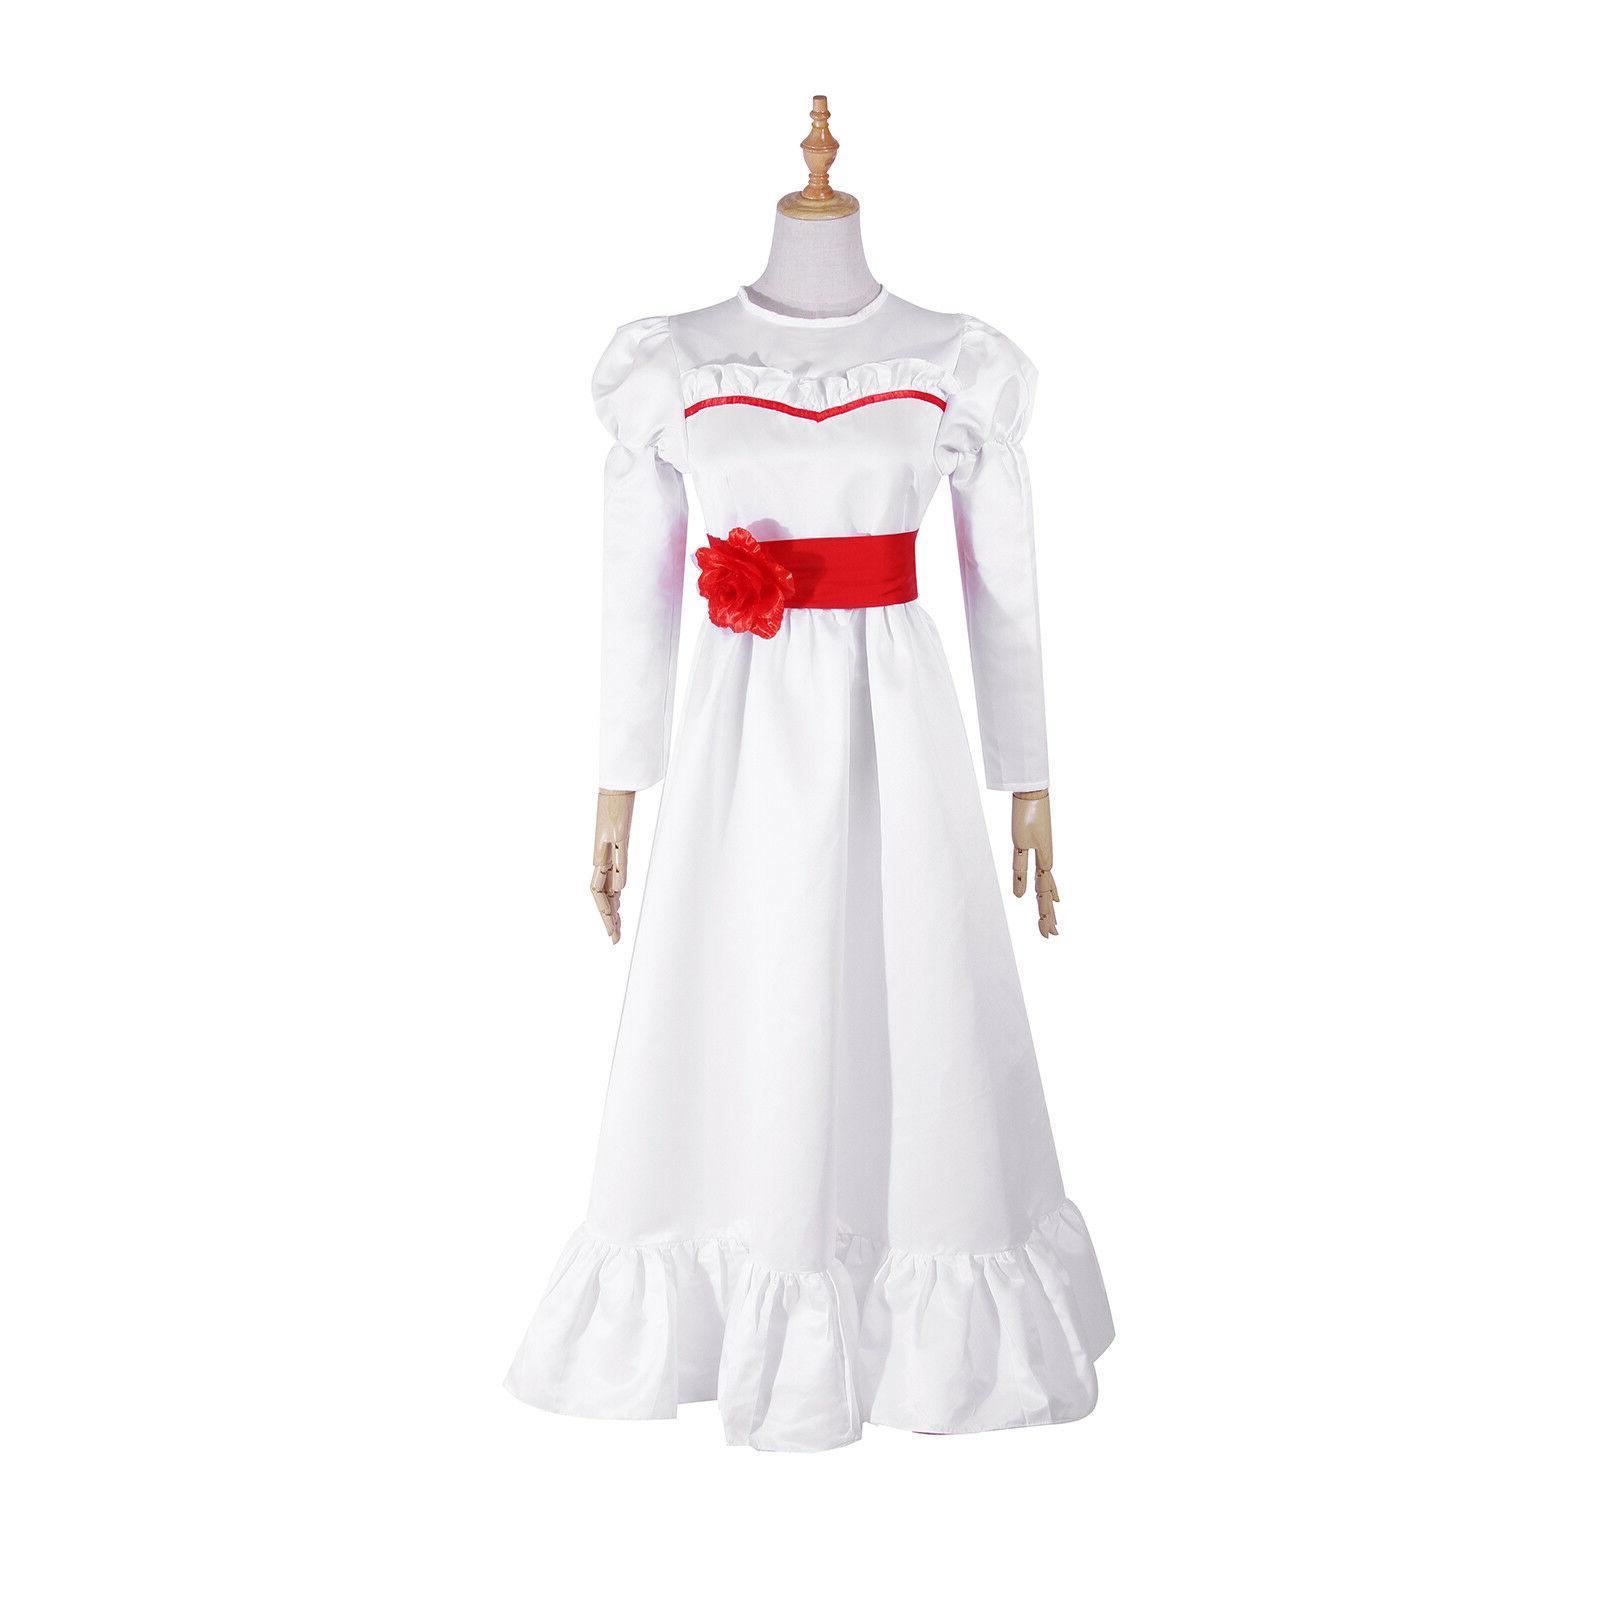 The Costume Halloween Long White